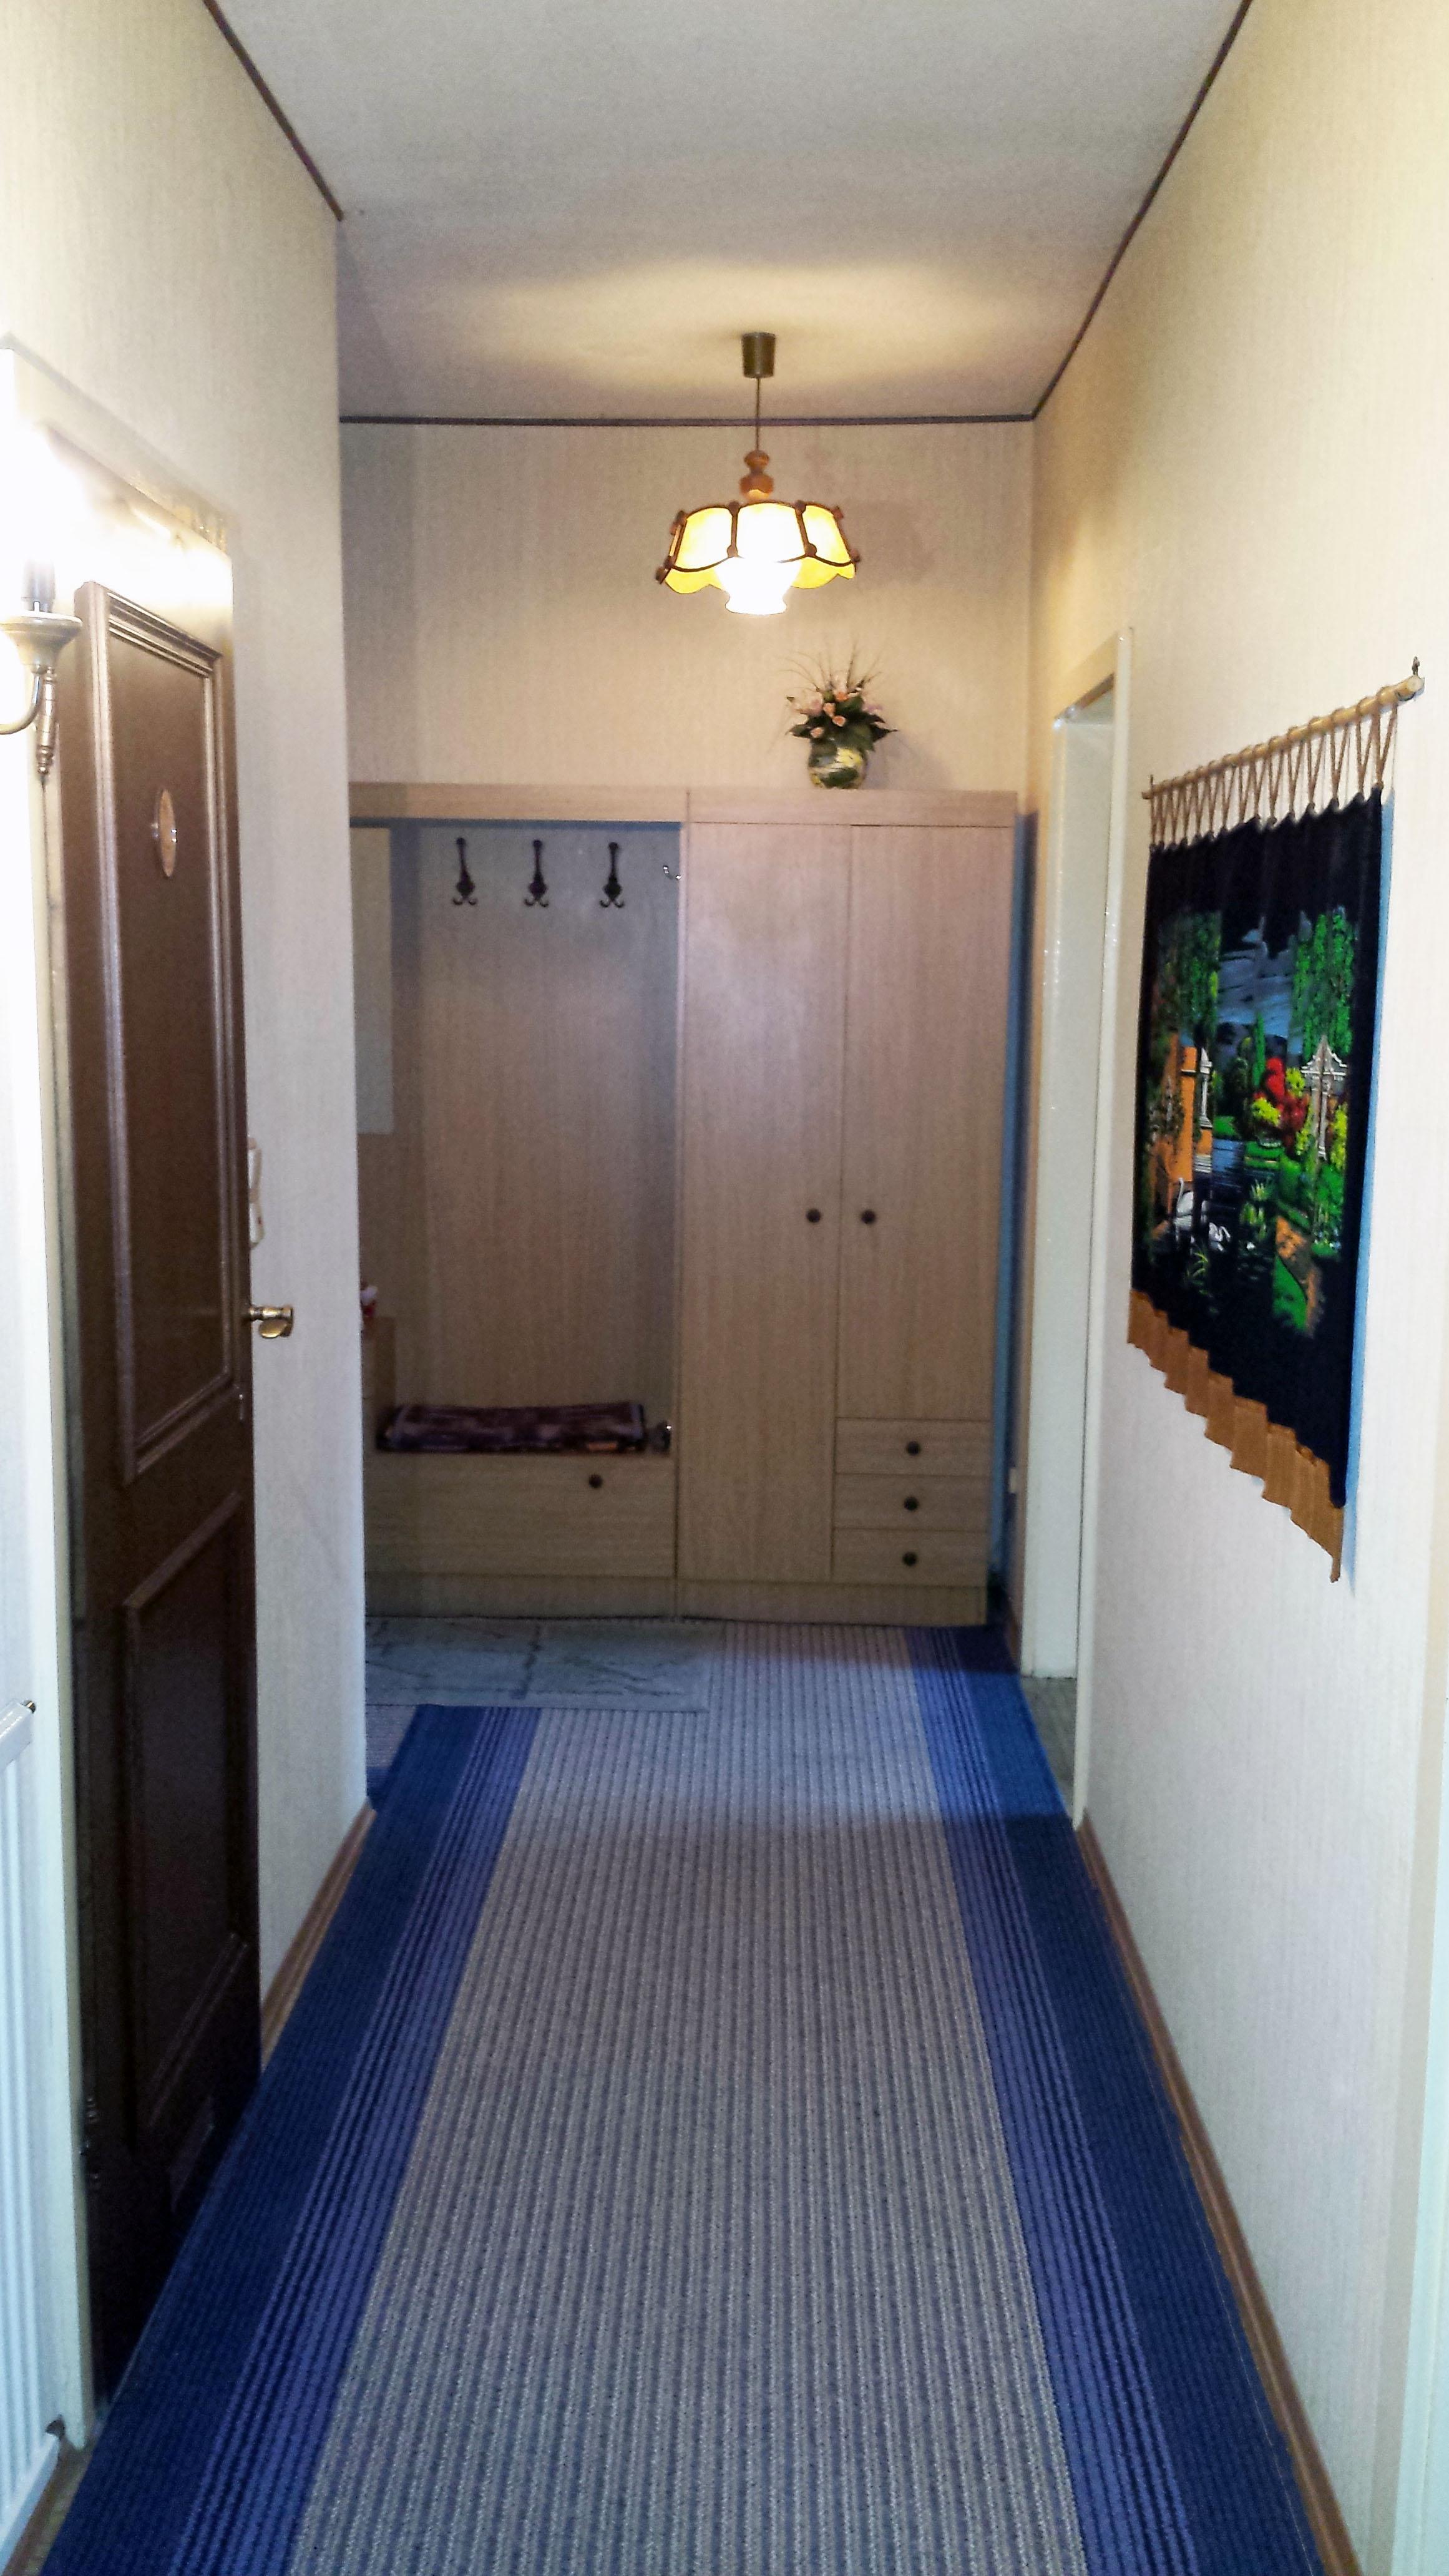 eigentumswohnung in 8230 hartberg erfolgreich. Black Bedroom Furniture Sets. Home Design Ideas